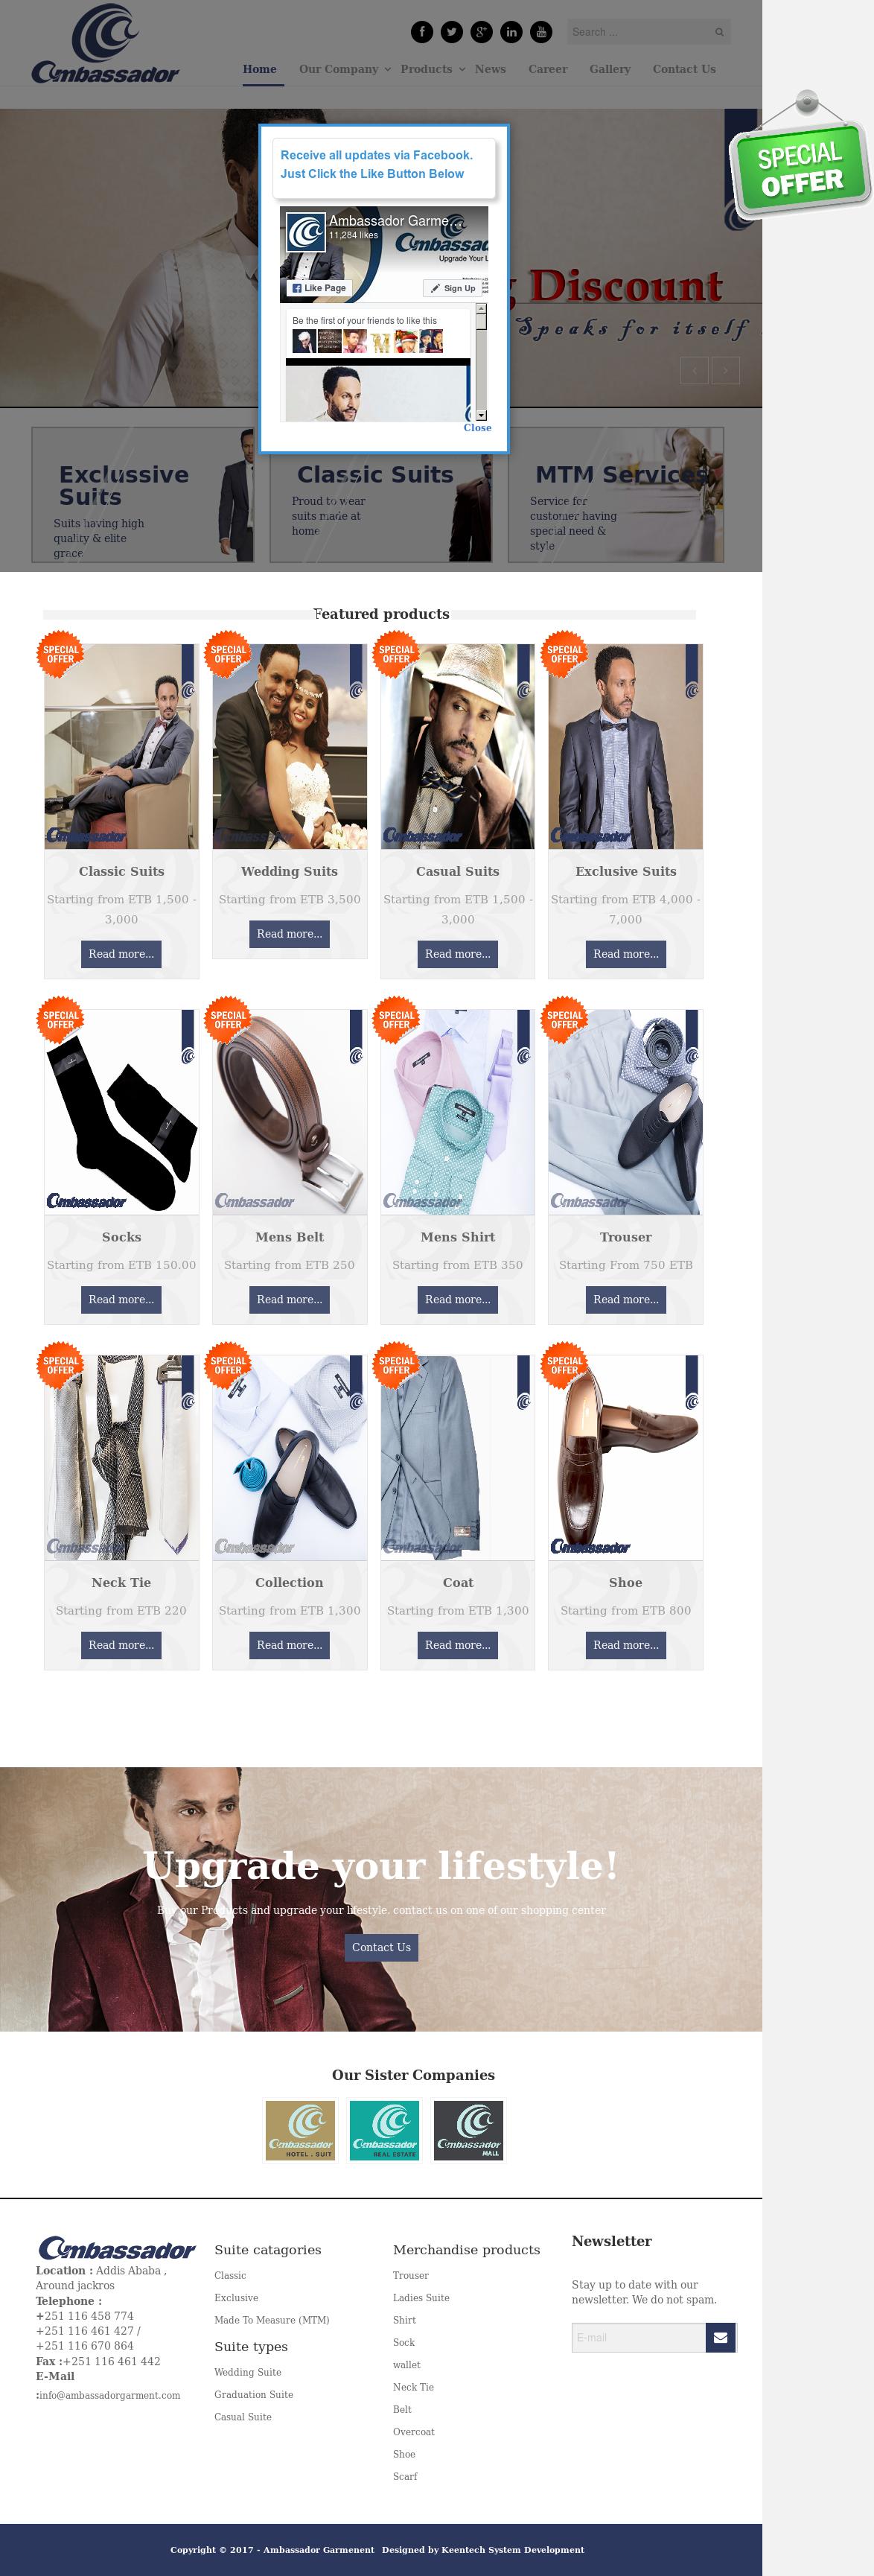 Ambassador Garment Competitors, Revenue and Employees